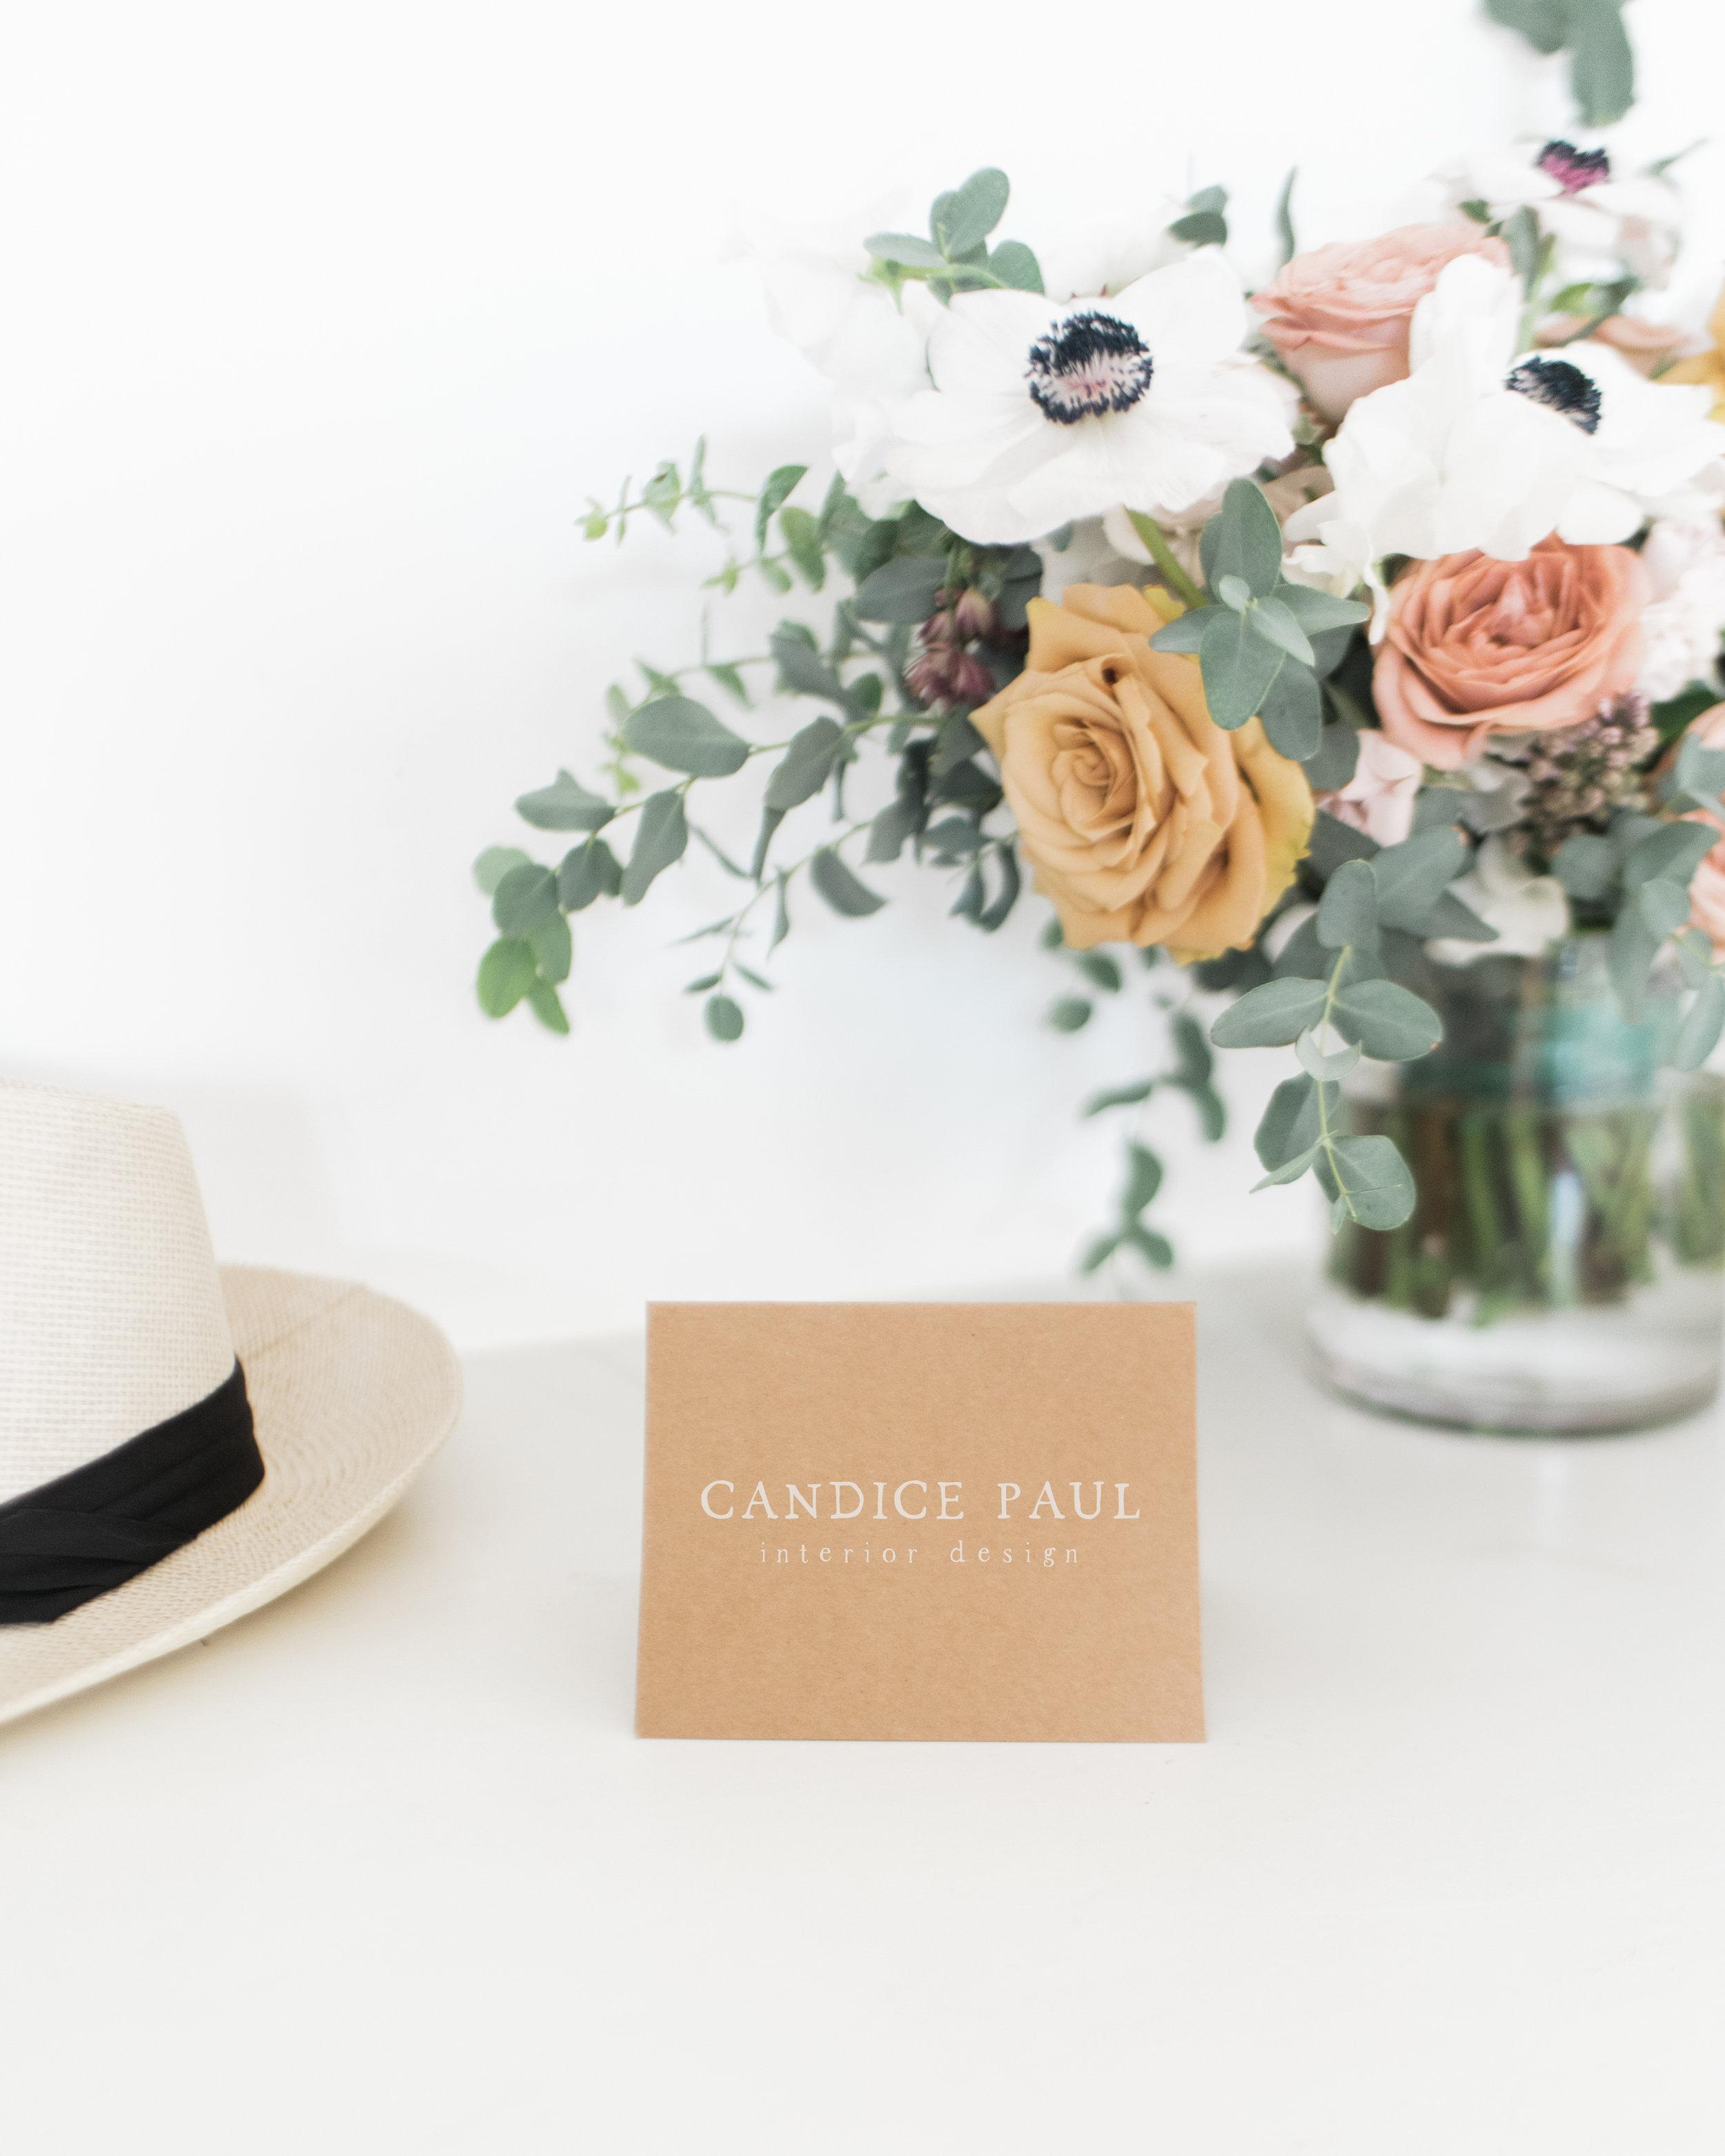 Candice Paul Listing.jpg